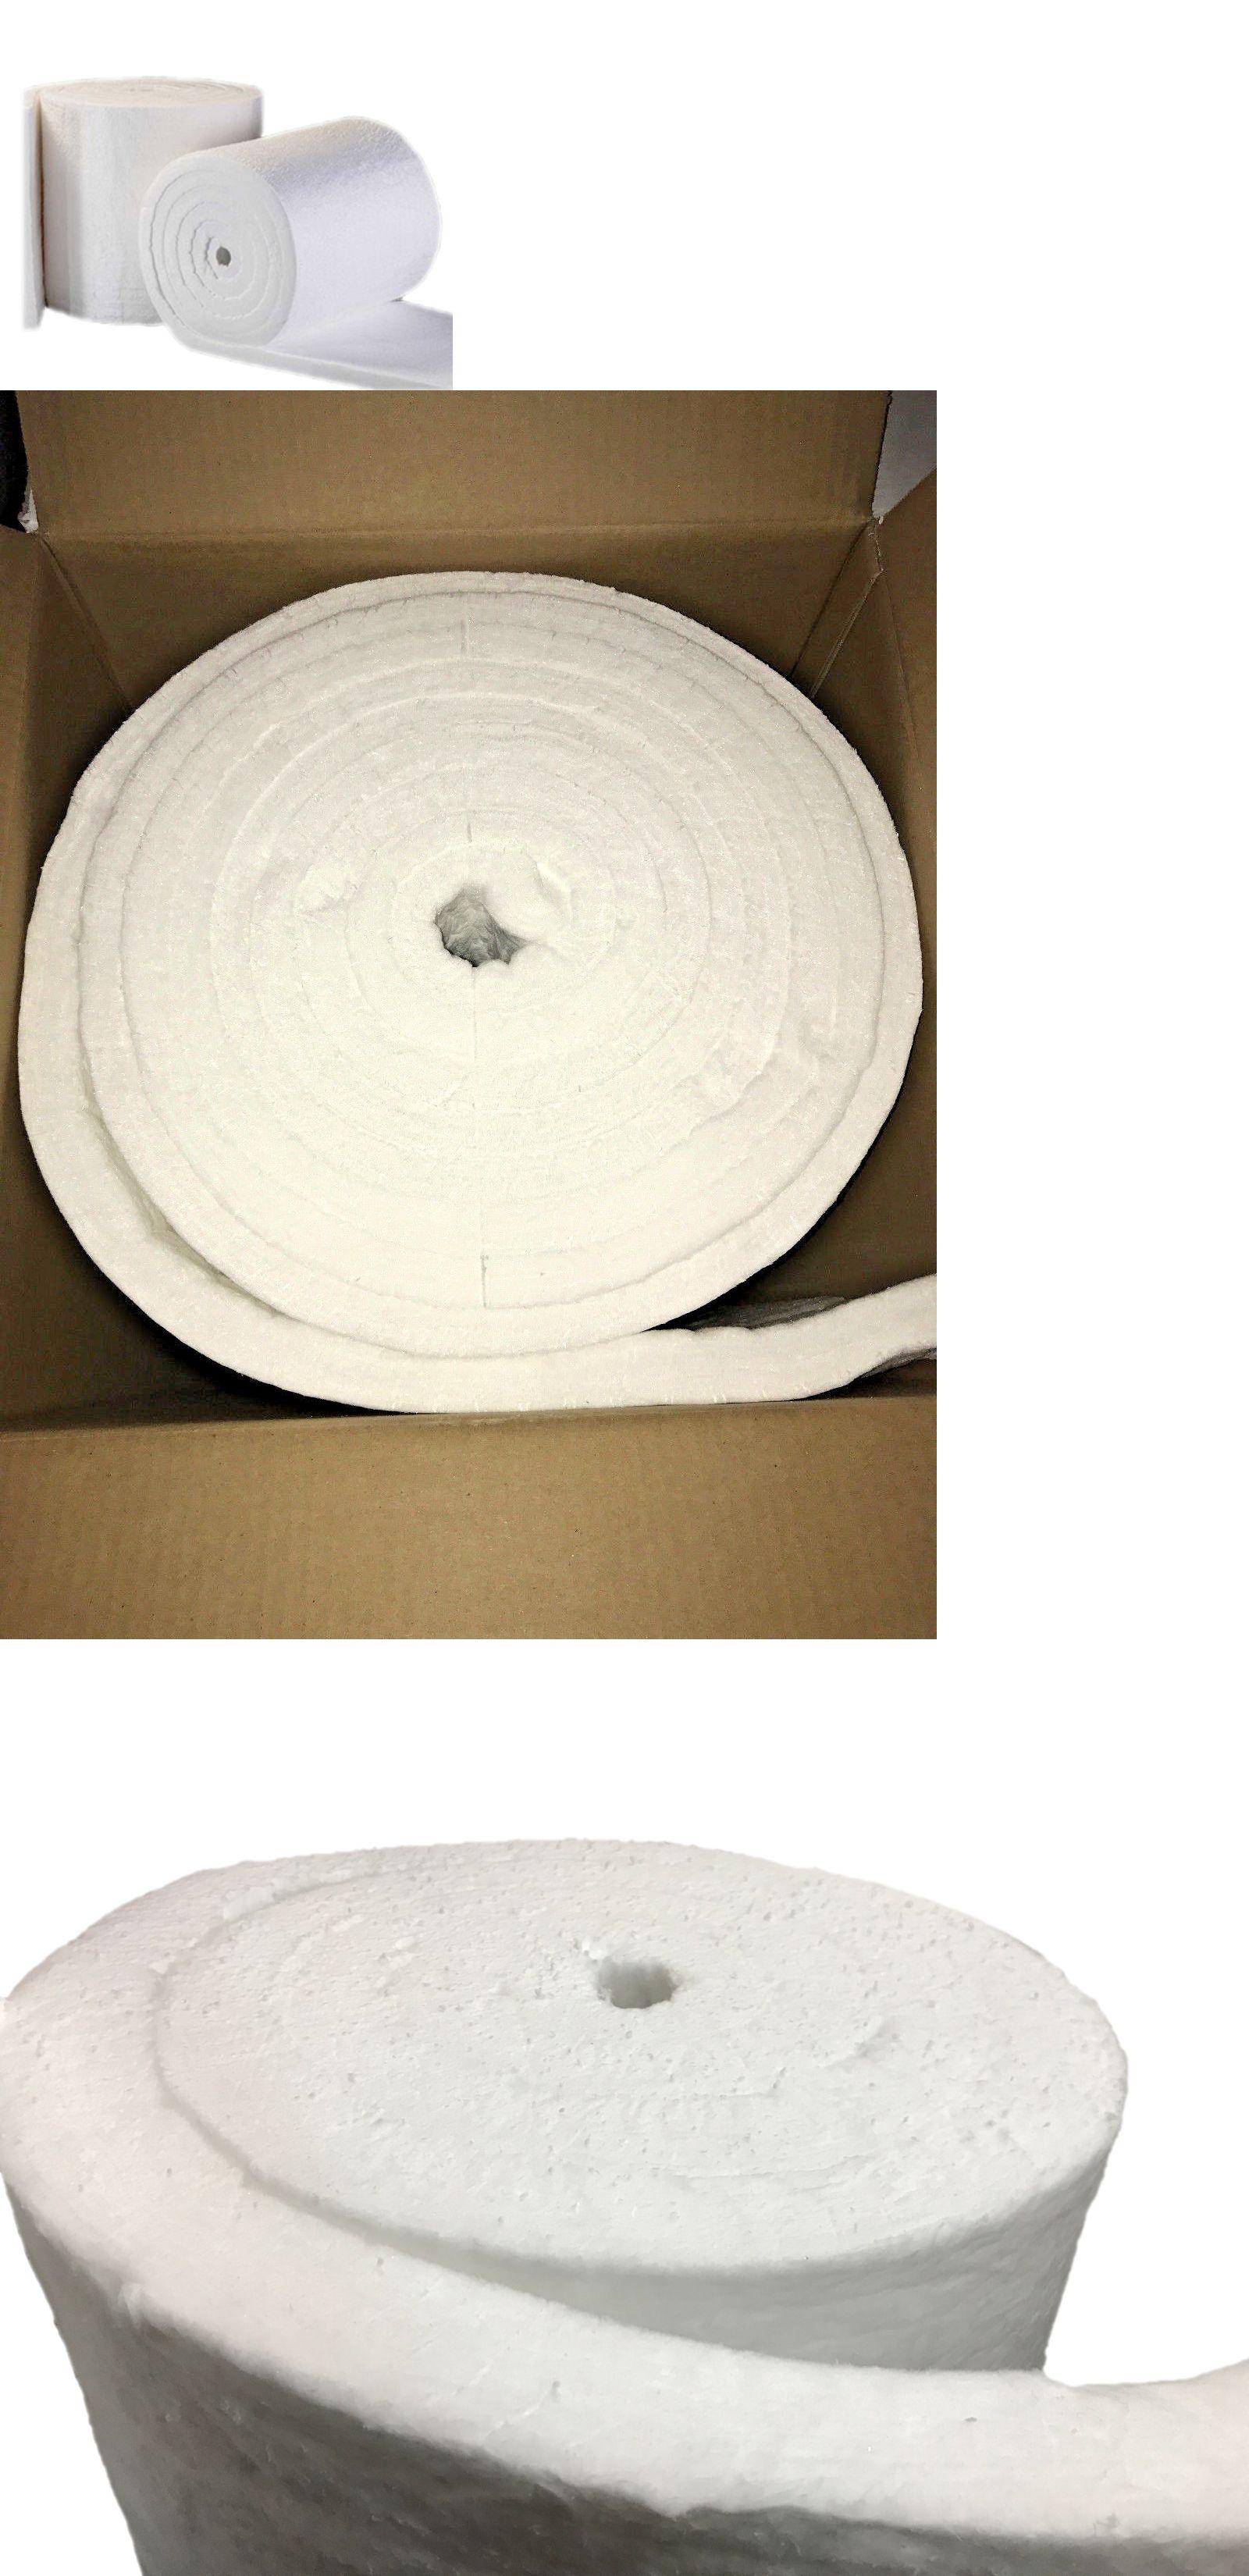 Other Ceramics And Pottery 183307 Ceramic Fiber Insulation Blanket 2300f 8lb 1 Inch X 24 Inch X 8 Foot Ro Ceramic Fiber Ceramic Fiber Blanket Fiber Insulation